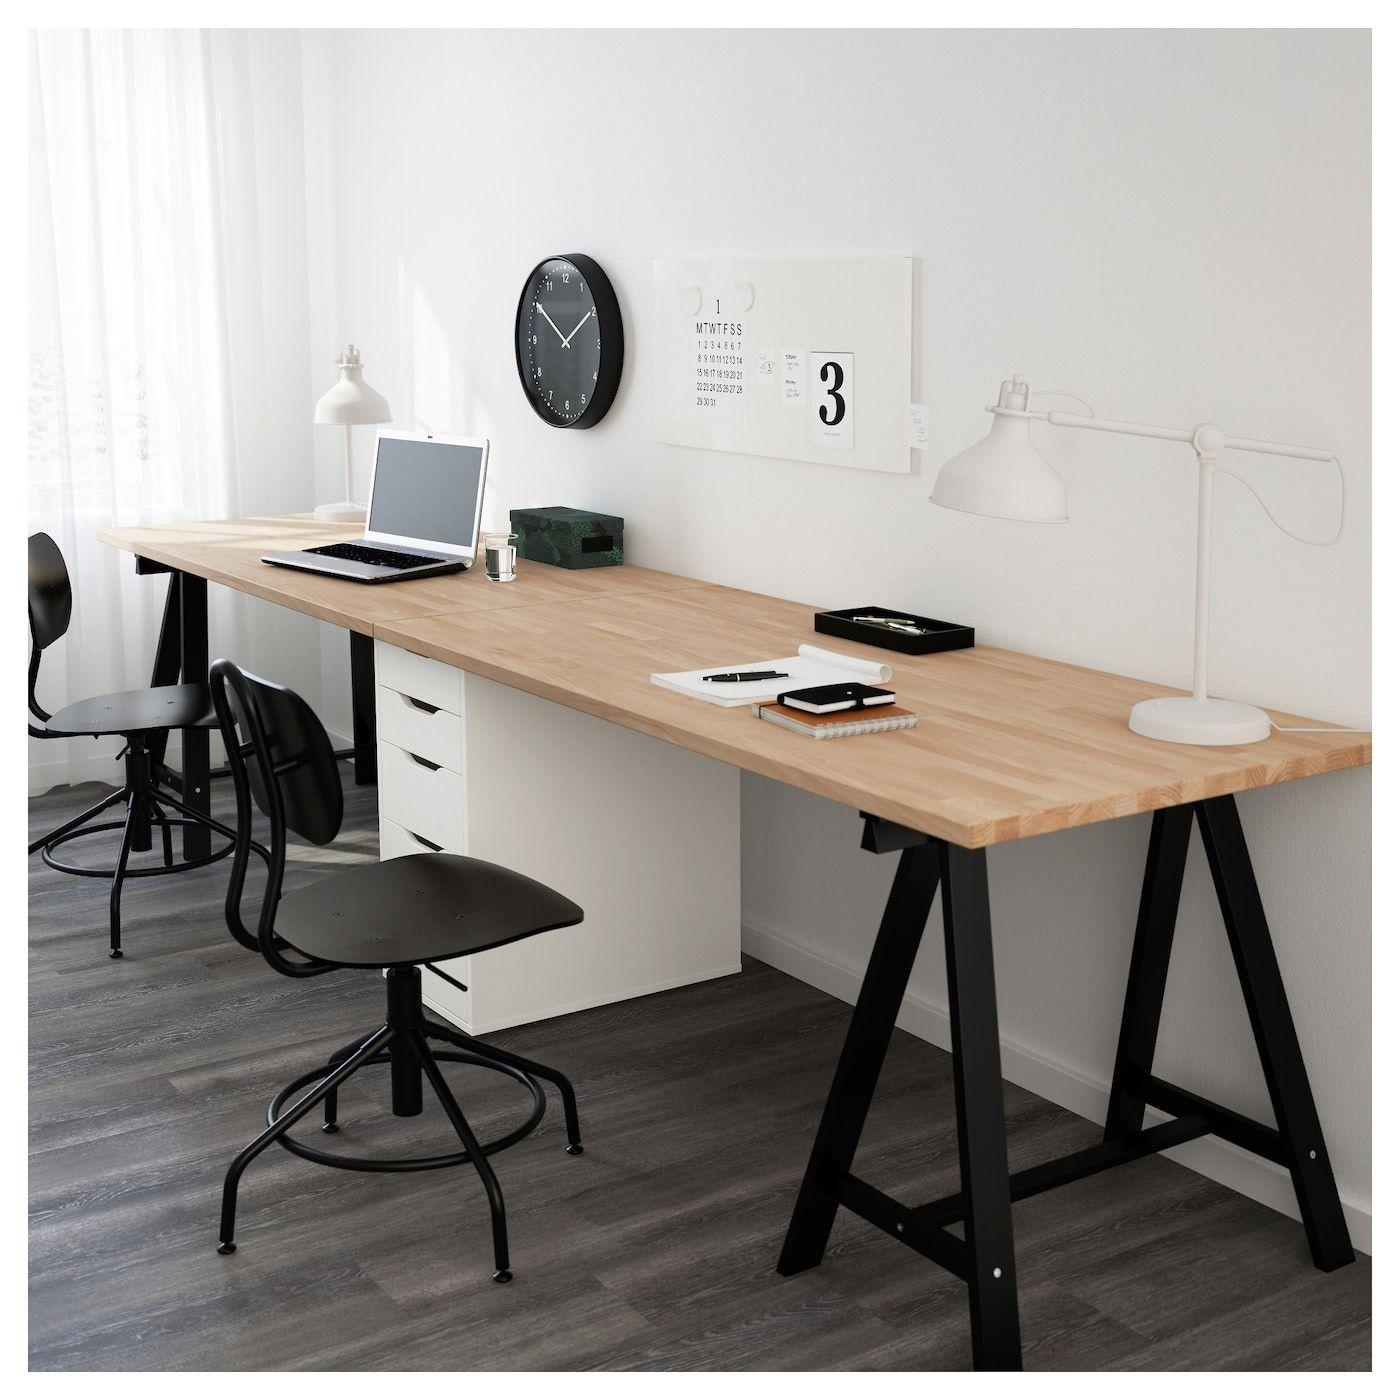 Ikea Bureau Zwart Wit.Gerton Tafel Beuken Zwart Wit Ikea In 2019 Werkkamer